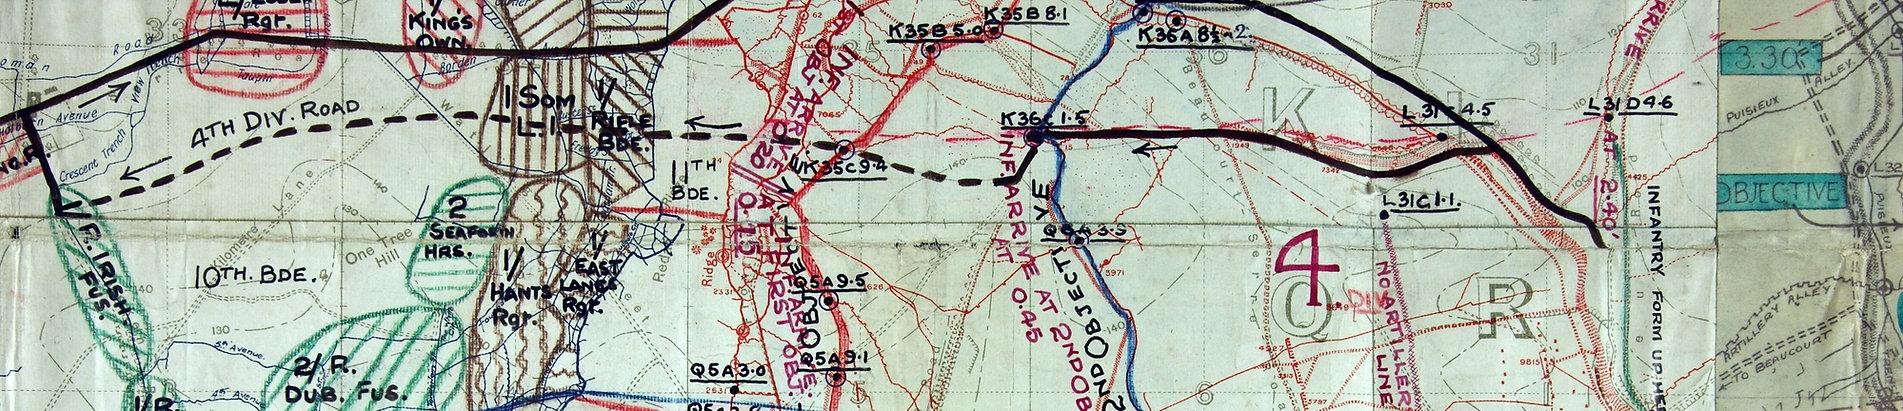 Beaumont Hamel WW1